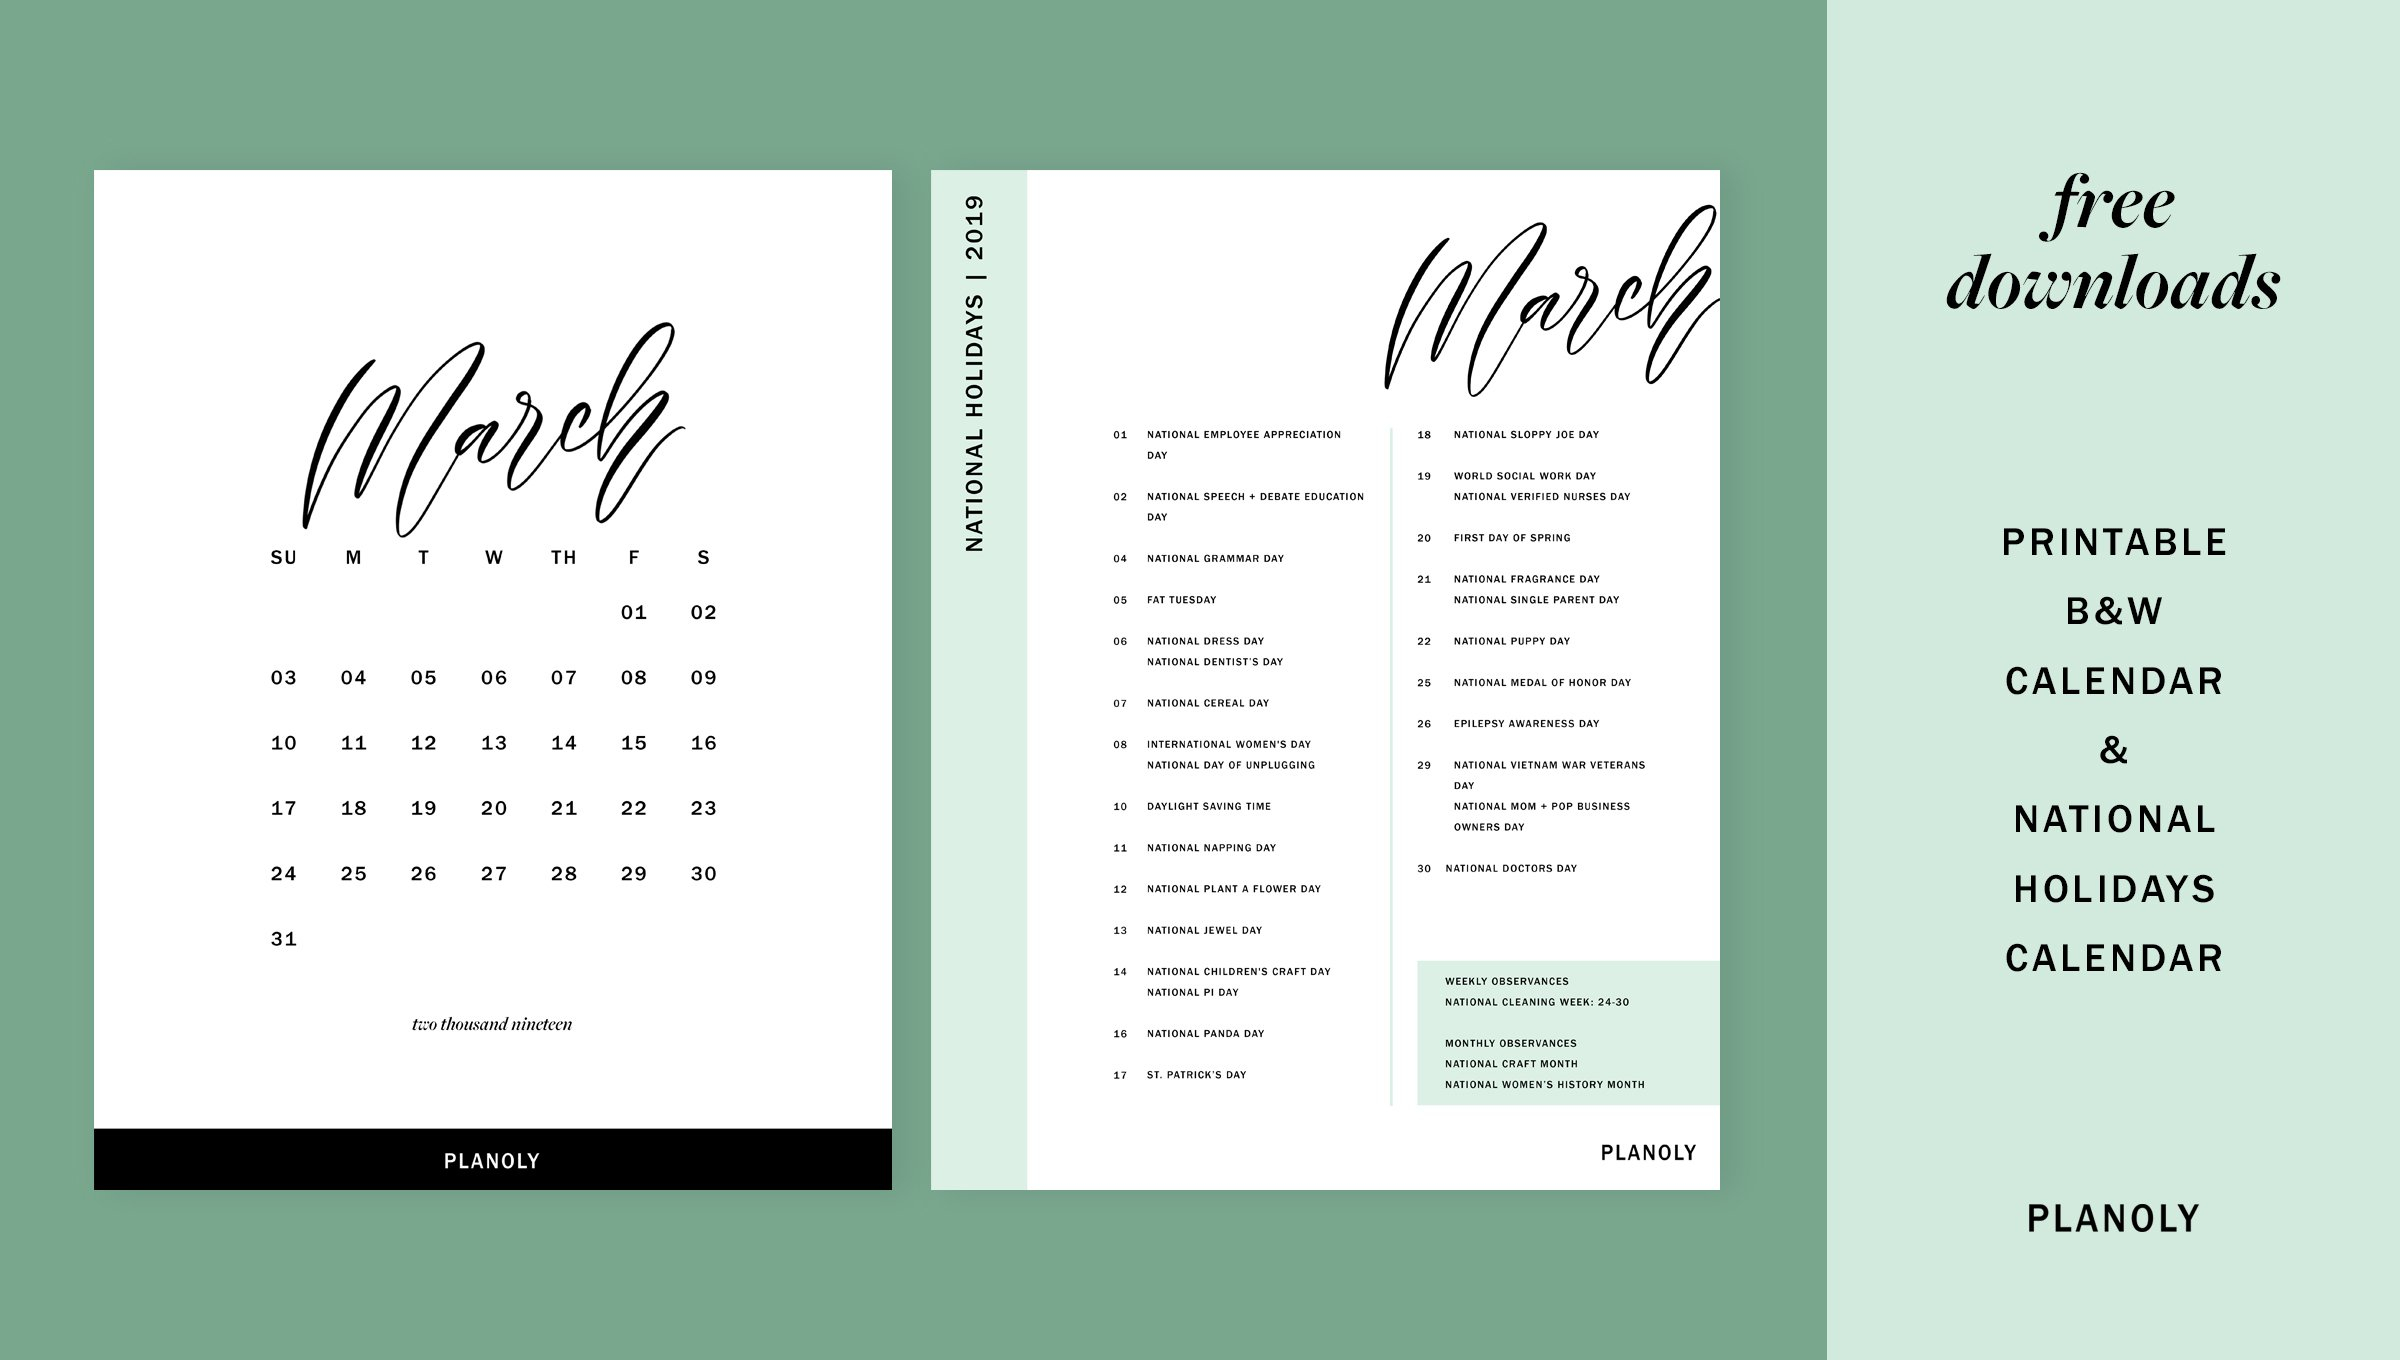 Q1 2019 Content Calendars - Planoly Calendar Q1 2019